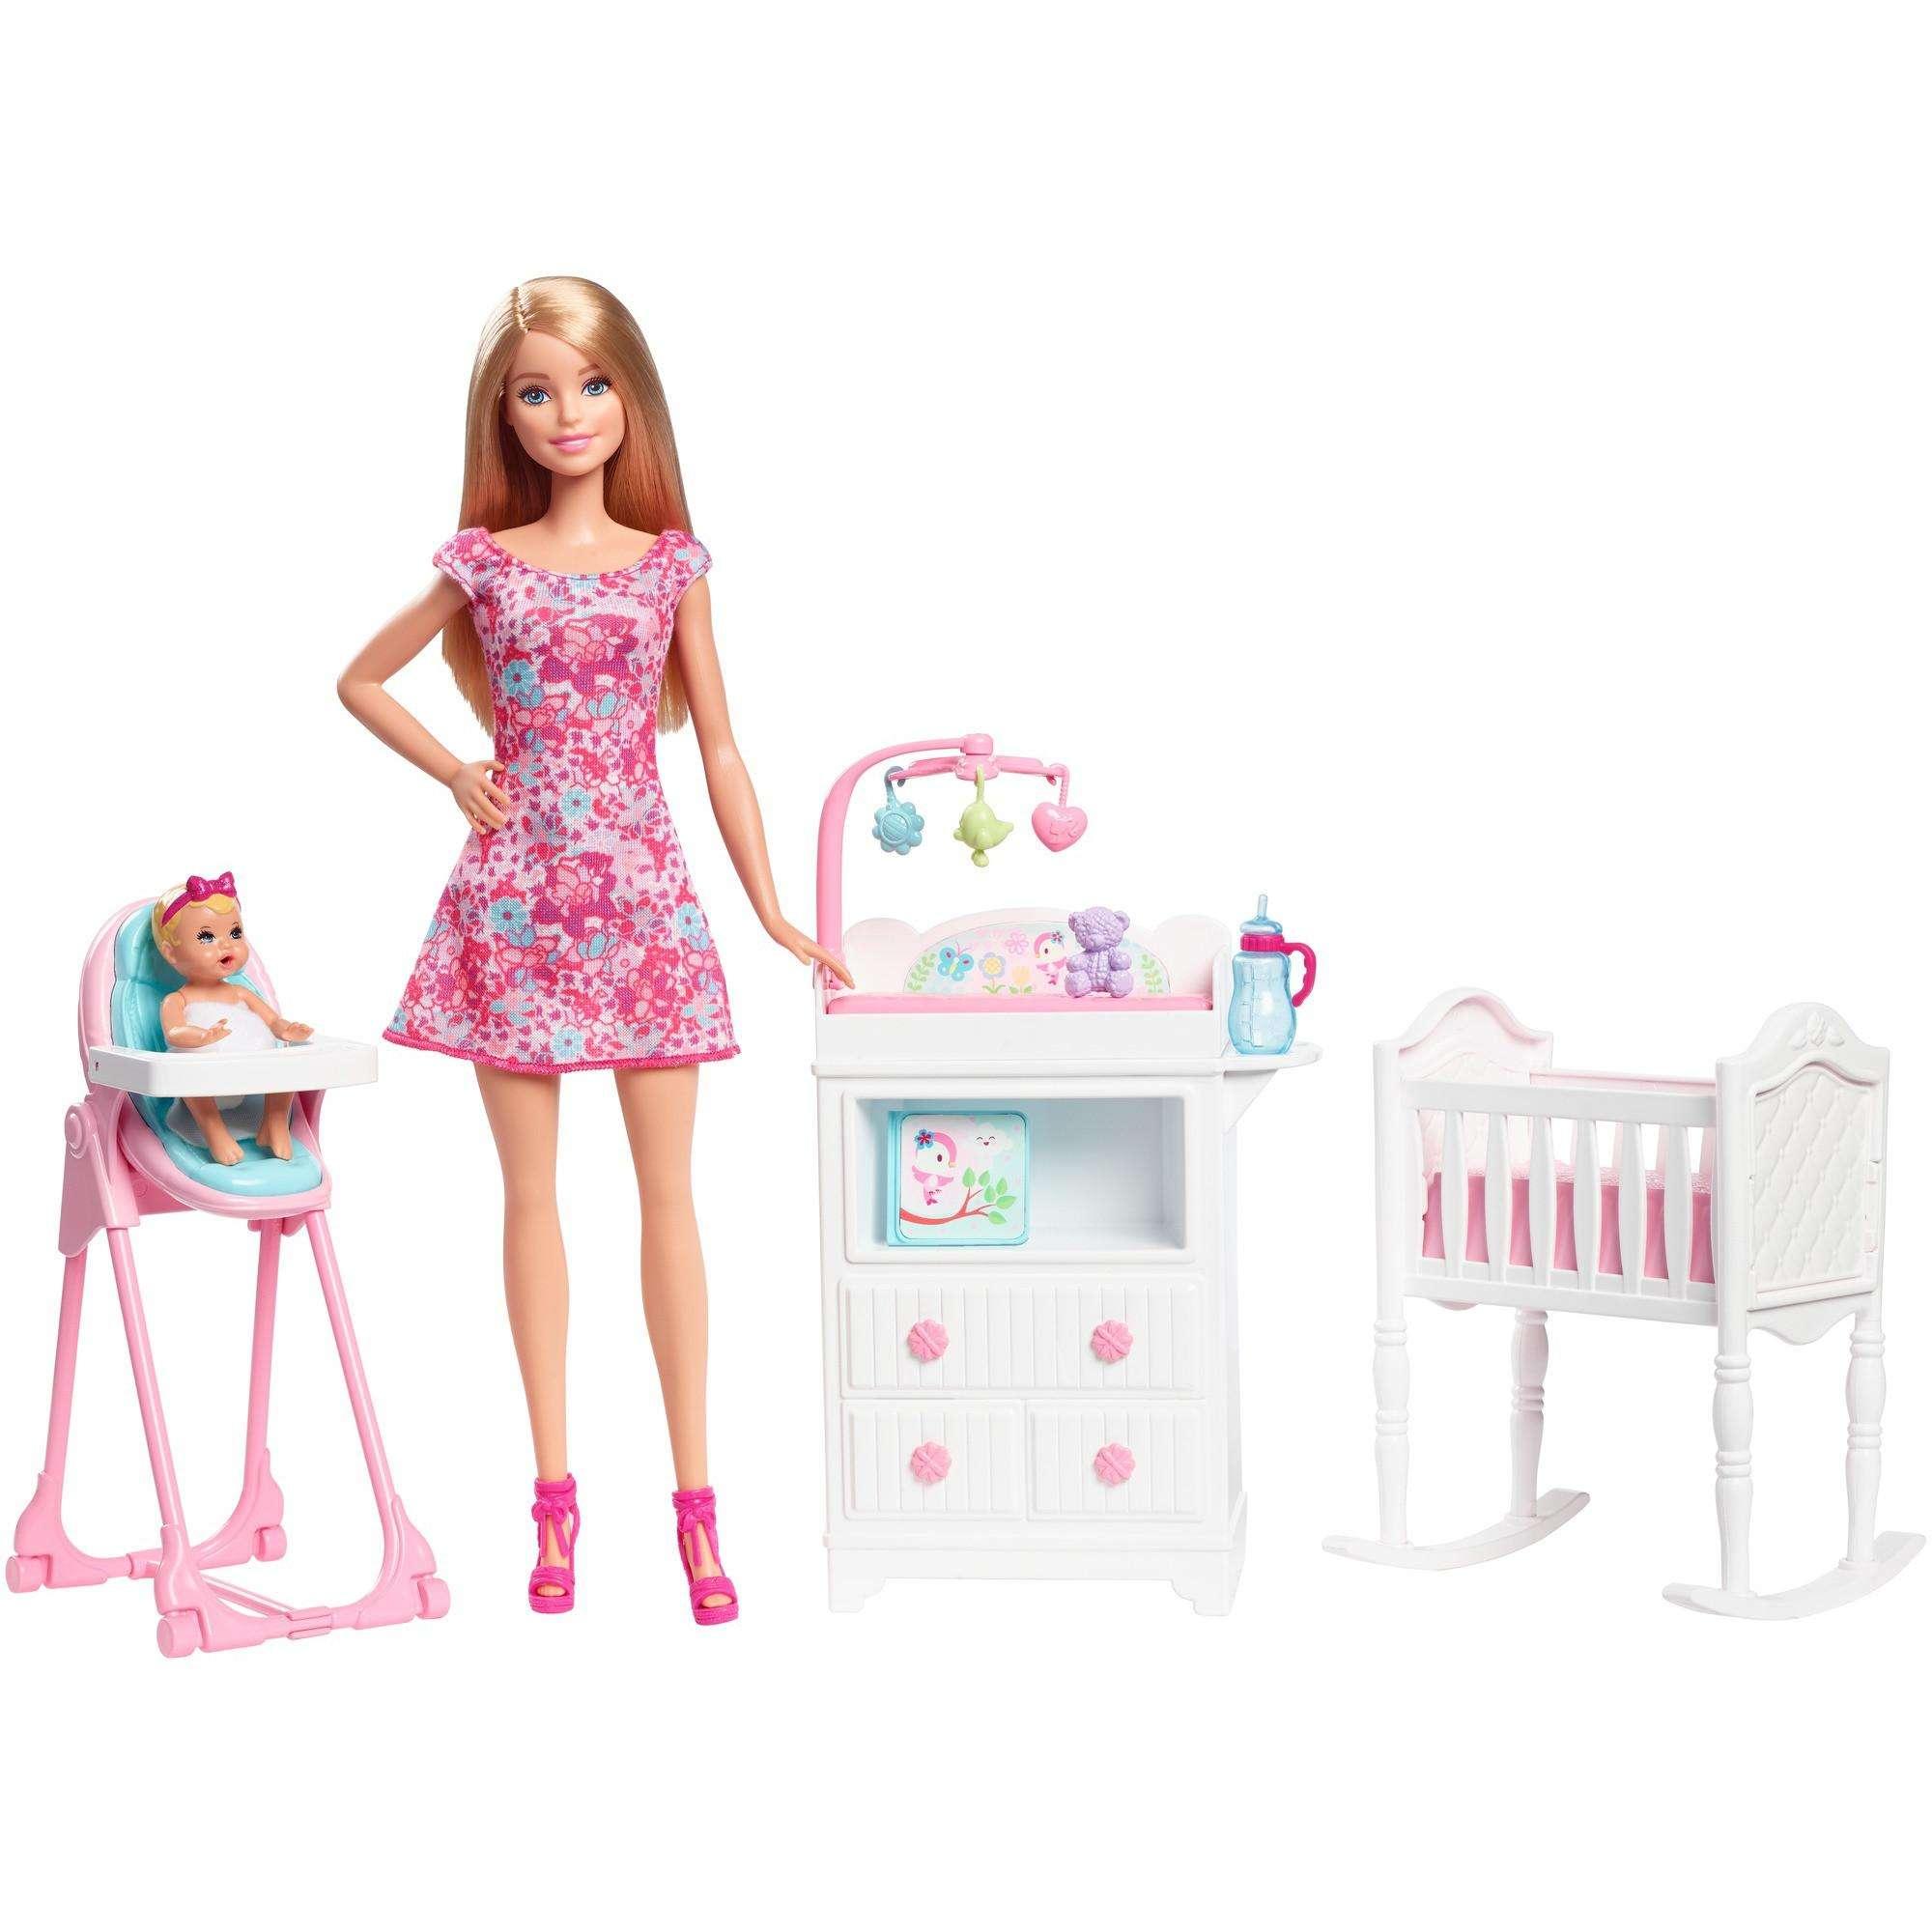 Barbie Learn with Barbie Babysitting Playset - Walmart.com